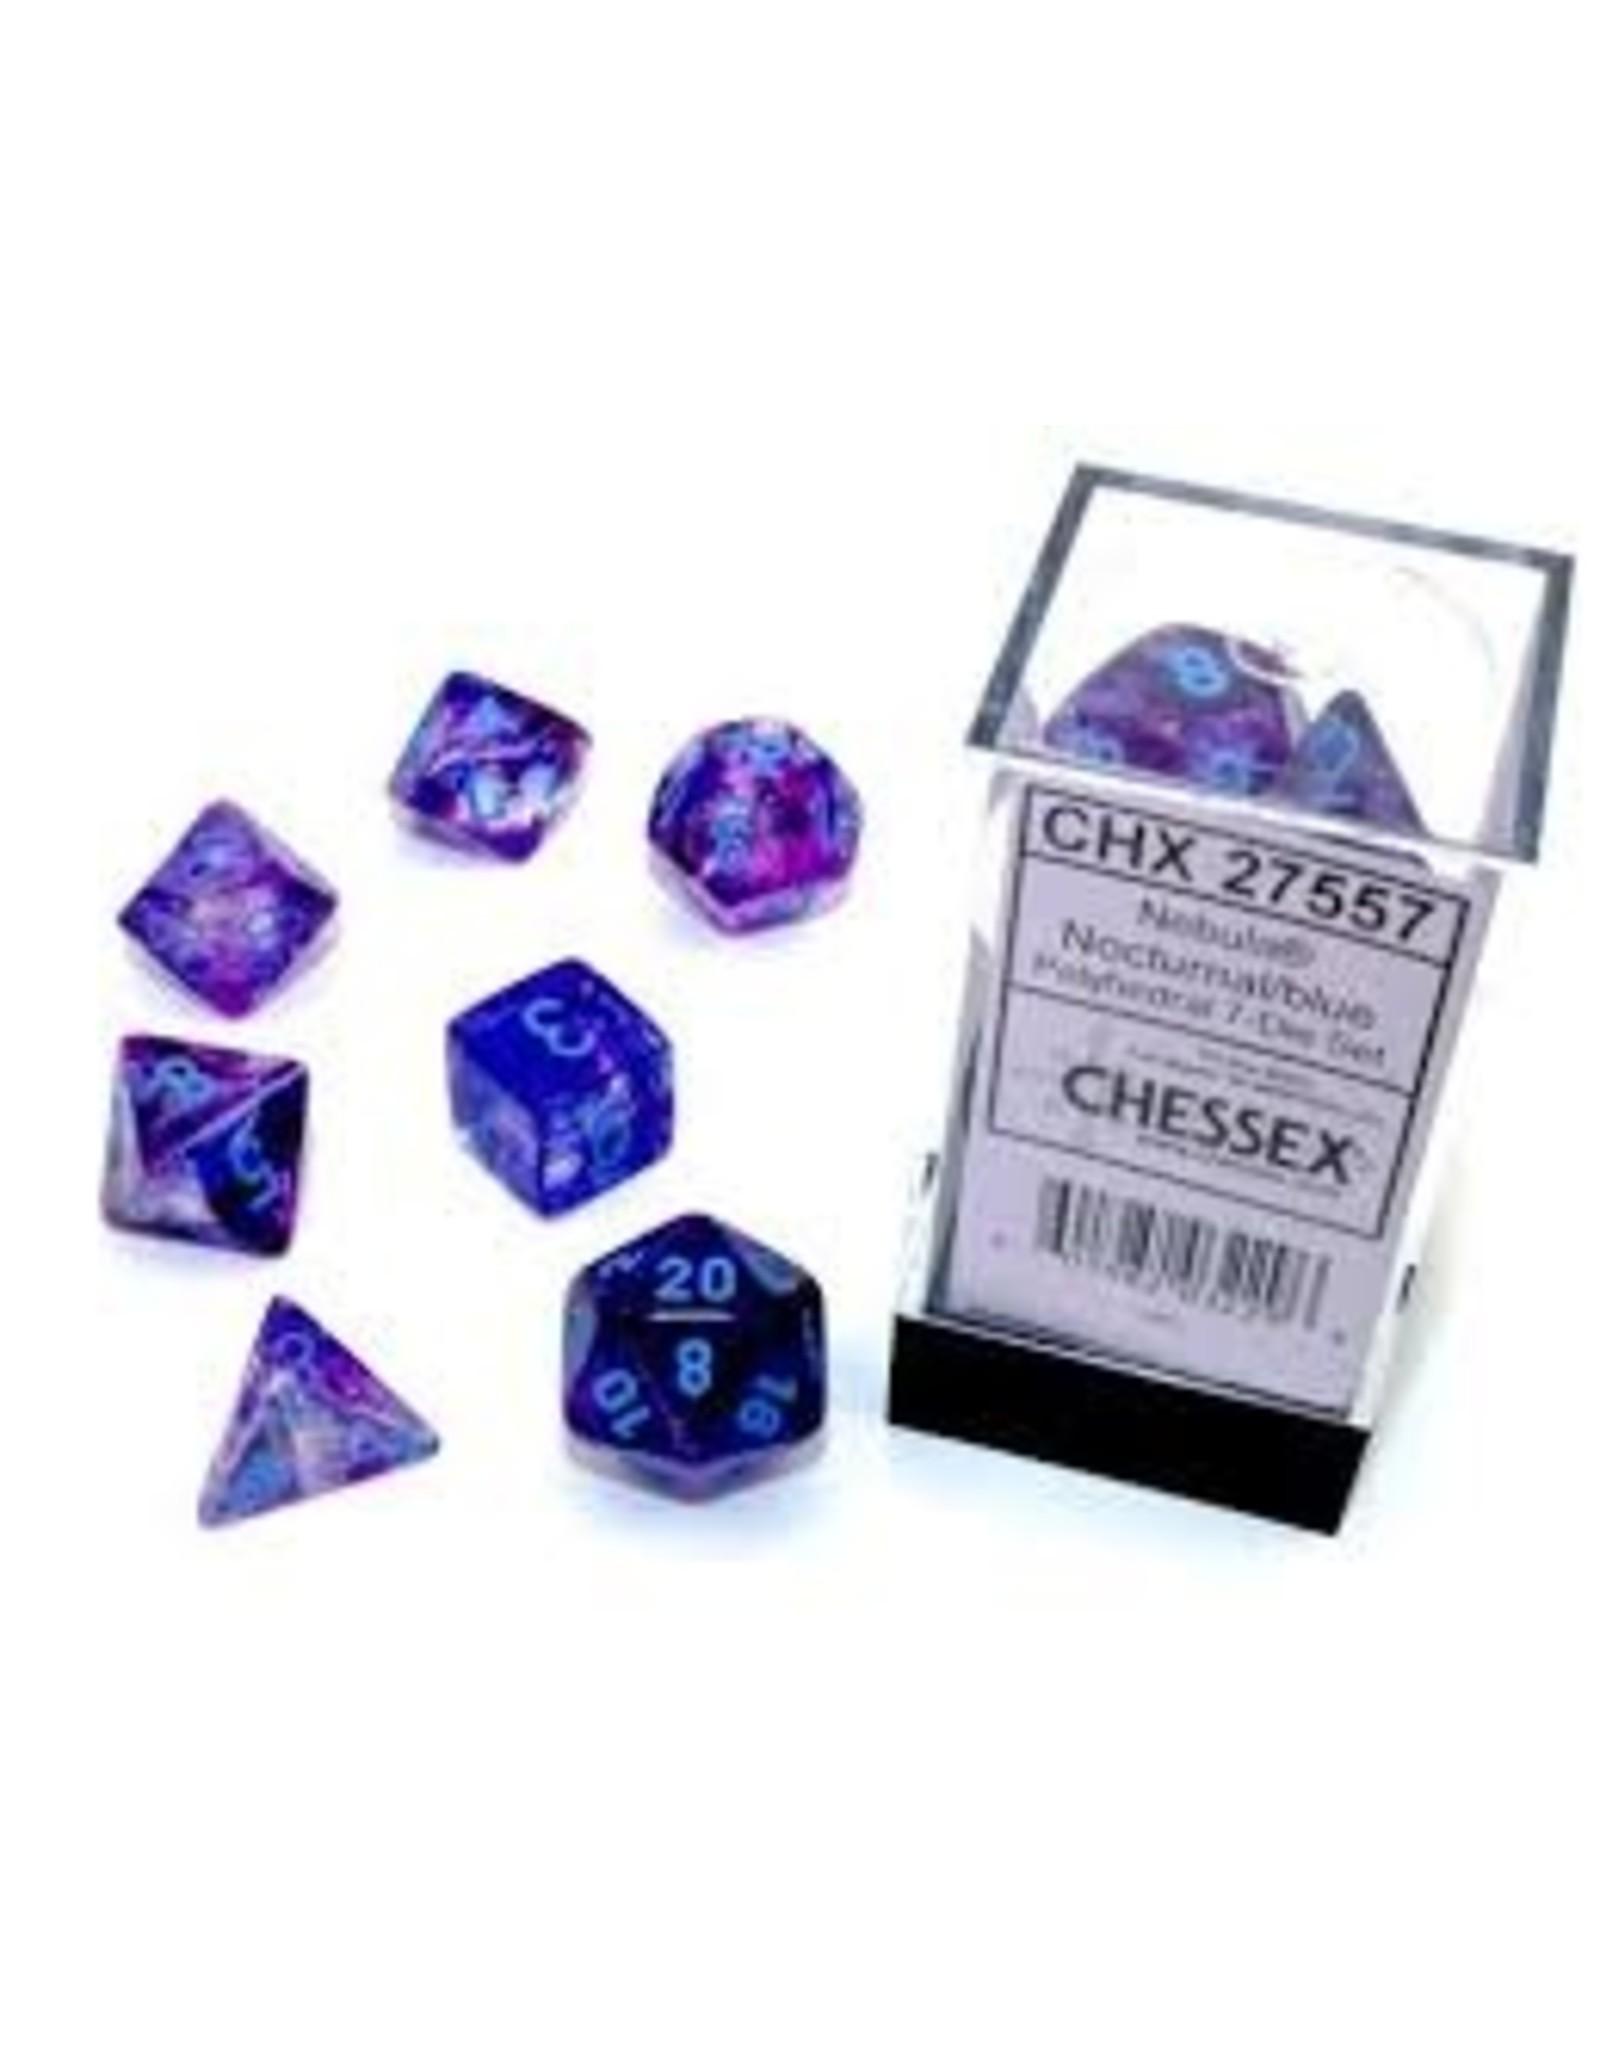 Chessex 7-setCube Luminary NB Nocturnal bu